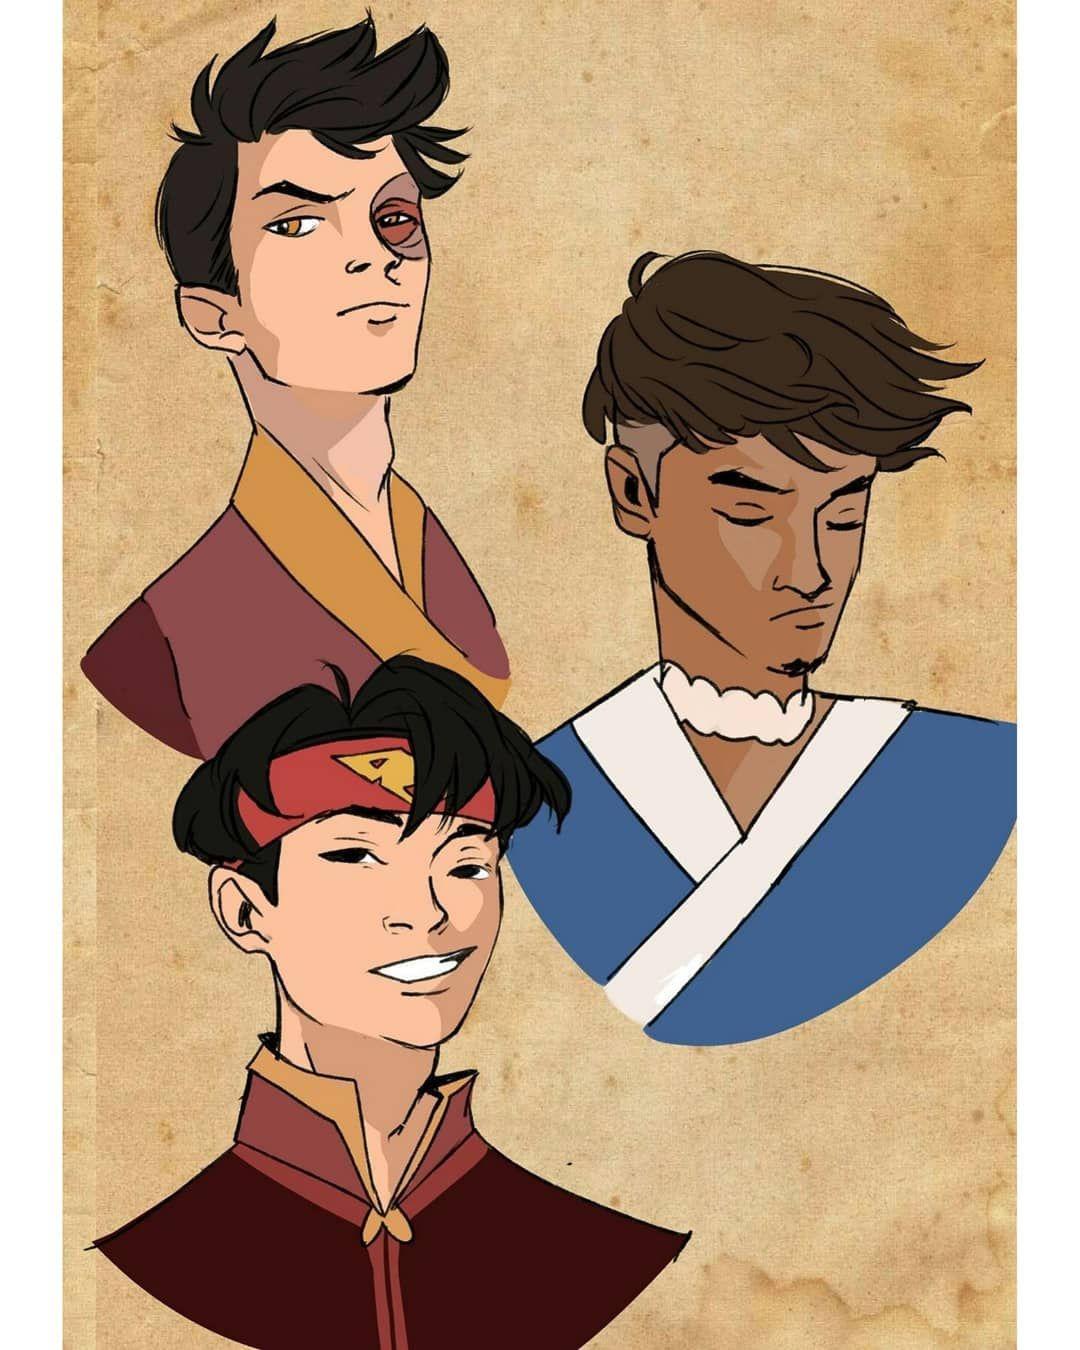 I Love Powerfull Boys Wait Aang With Long Hair And Sokka With Beard So Nice If You Wi Avatar Airbender Avatar The Last Airbender Art Avatar Characters